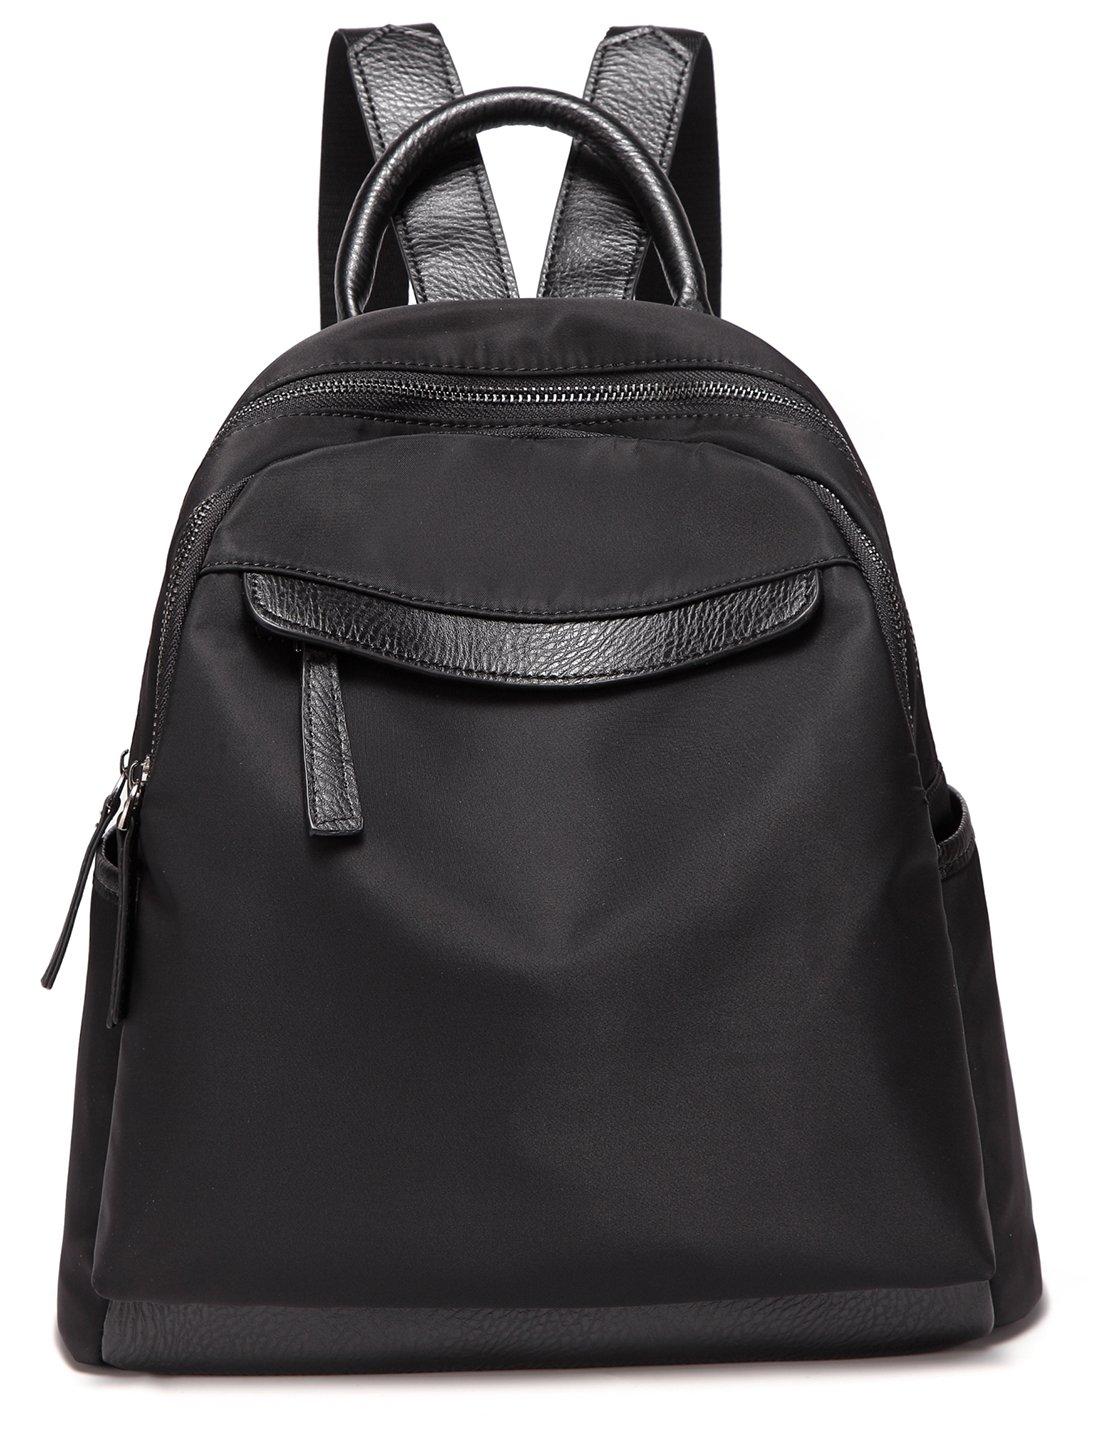 Small Fashion Backpacks for Women Daypack Waterproof Nylon Rucksack Girls School Bag